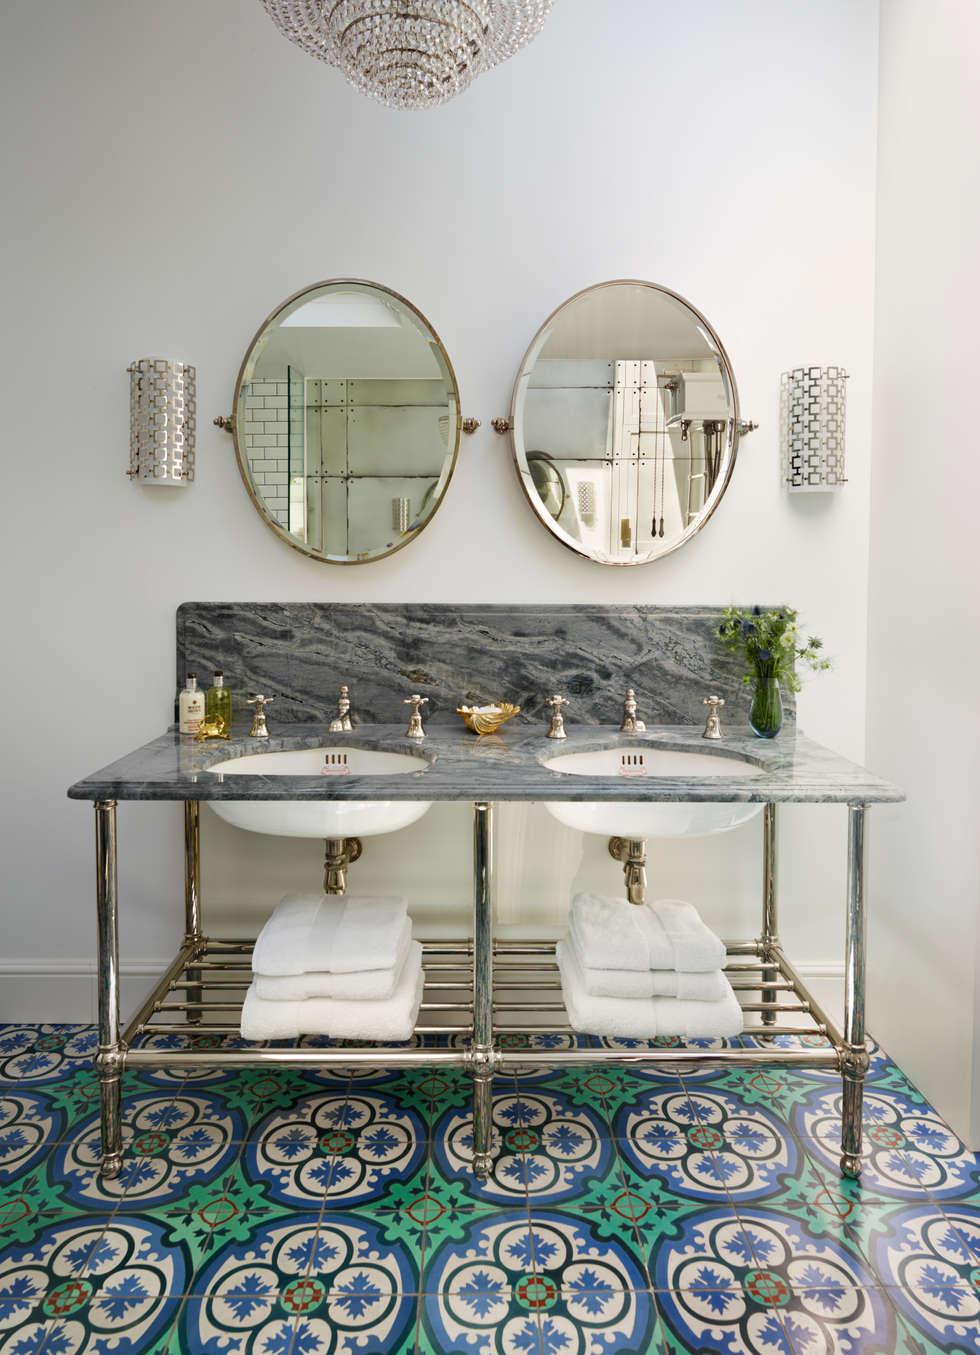 Interior design ideas redecorating remodeling photos for Victorian terrace bathroom ideas